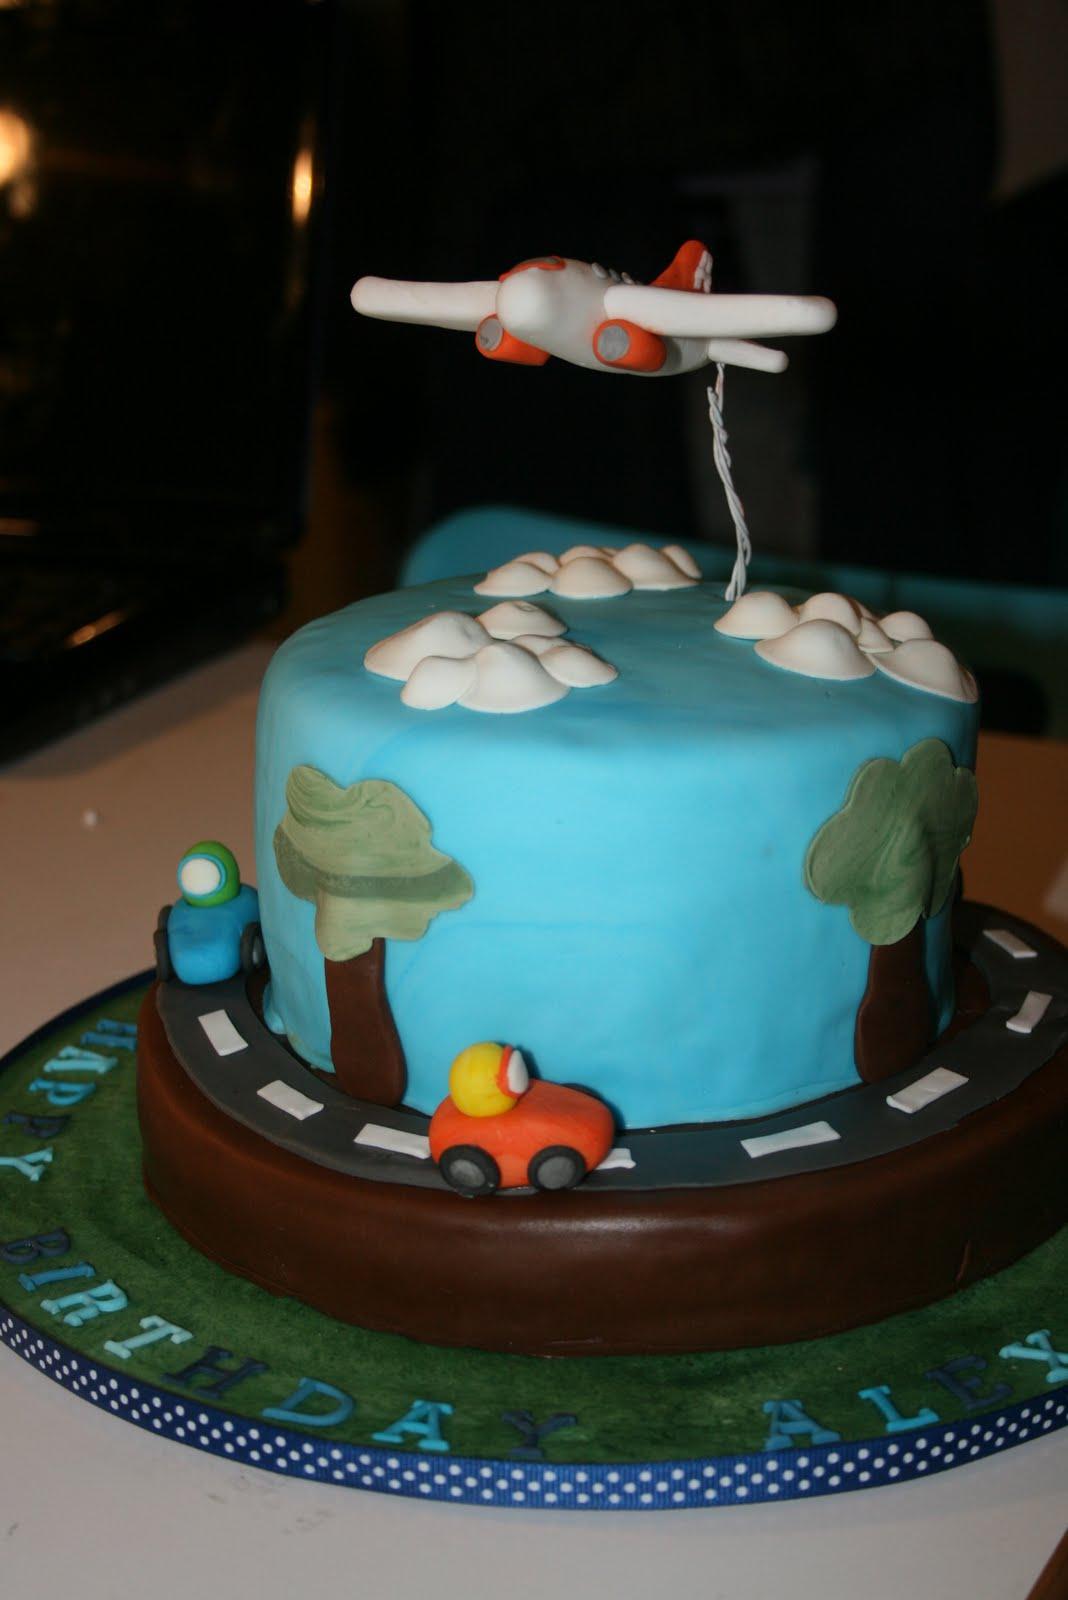 http://4.bp.blogspot.com/_qVodjxE8fos/TJZ9TjQFEXI/AAAAAAAAADA/C6k1uysAXAk/s1600/cakes%20008.JPG